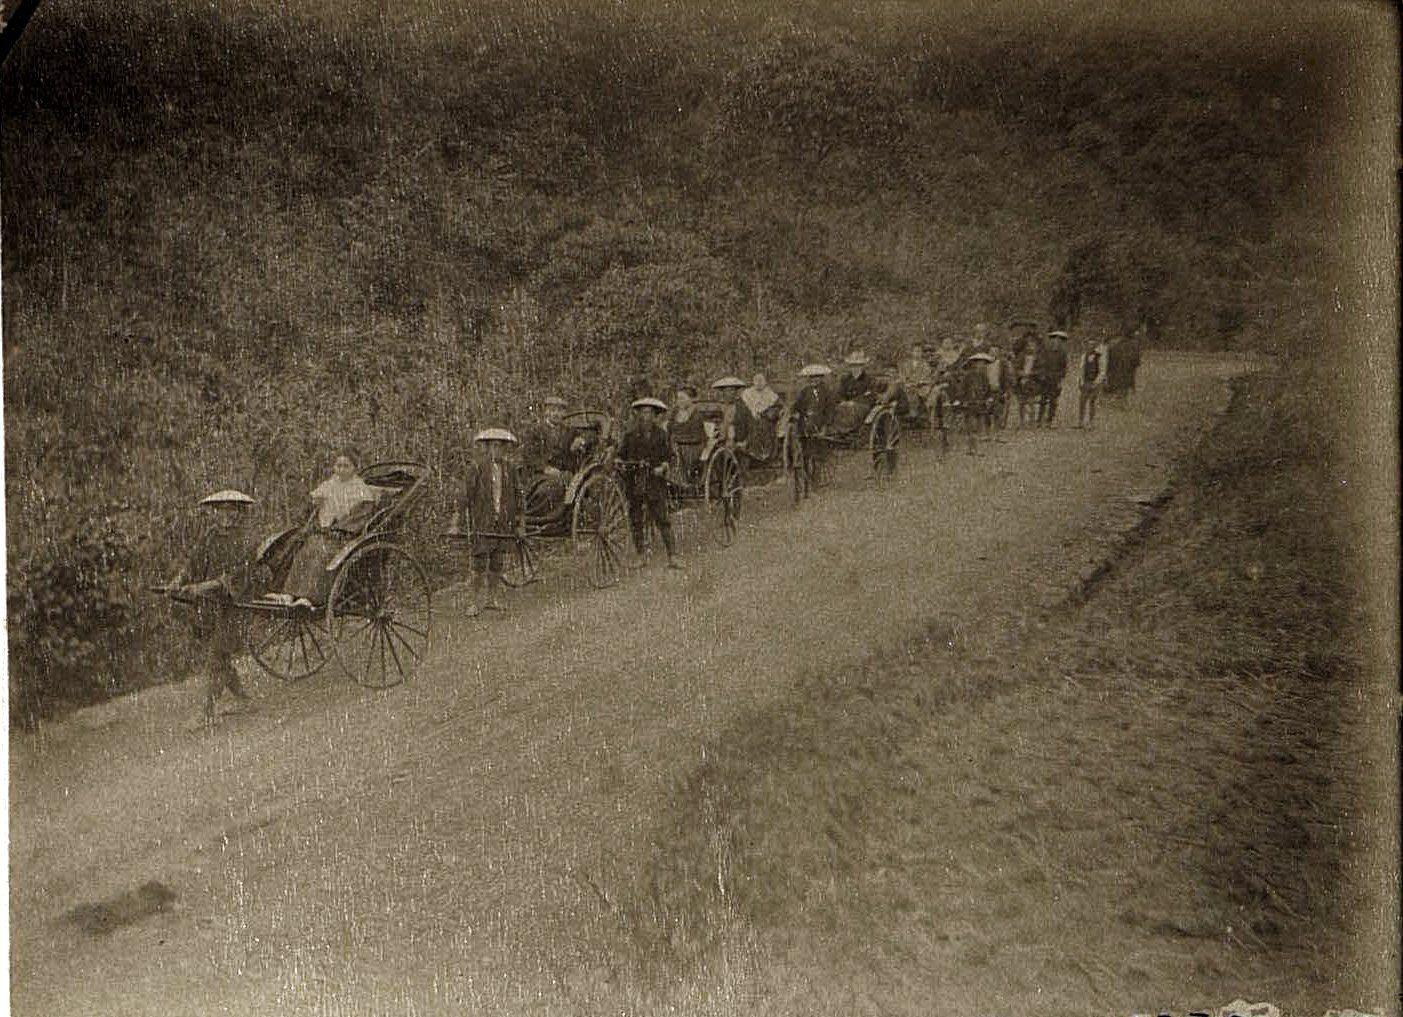 1899. Нагасаки. Прогулка на рикшах